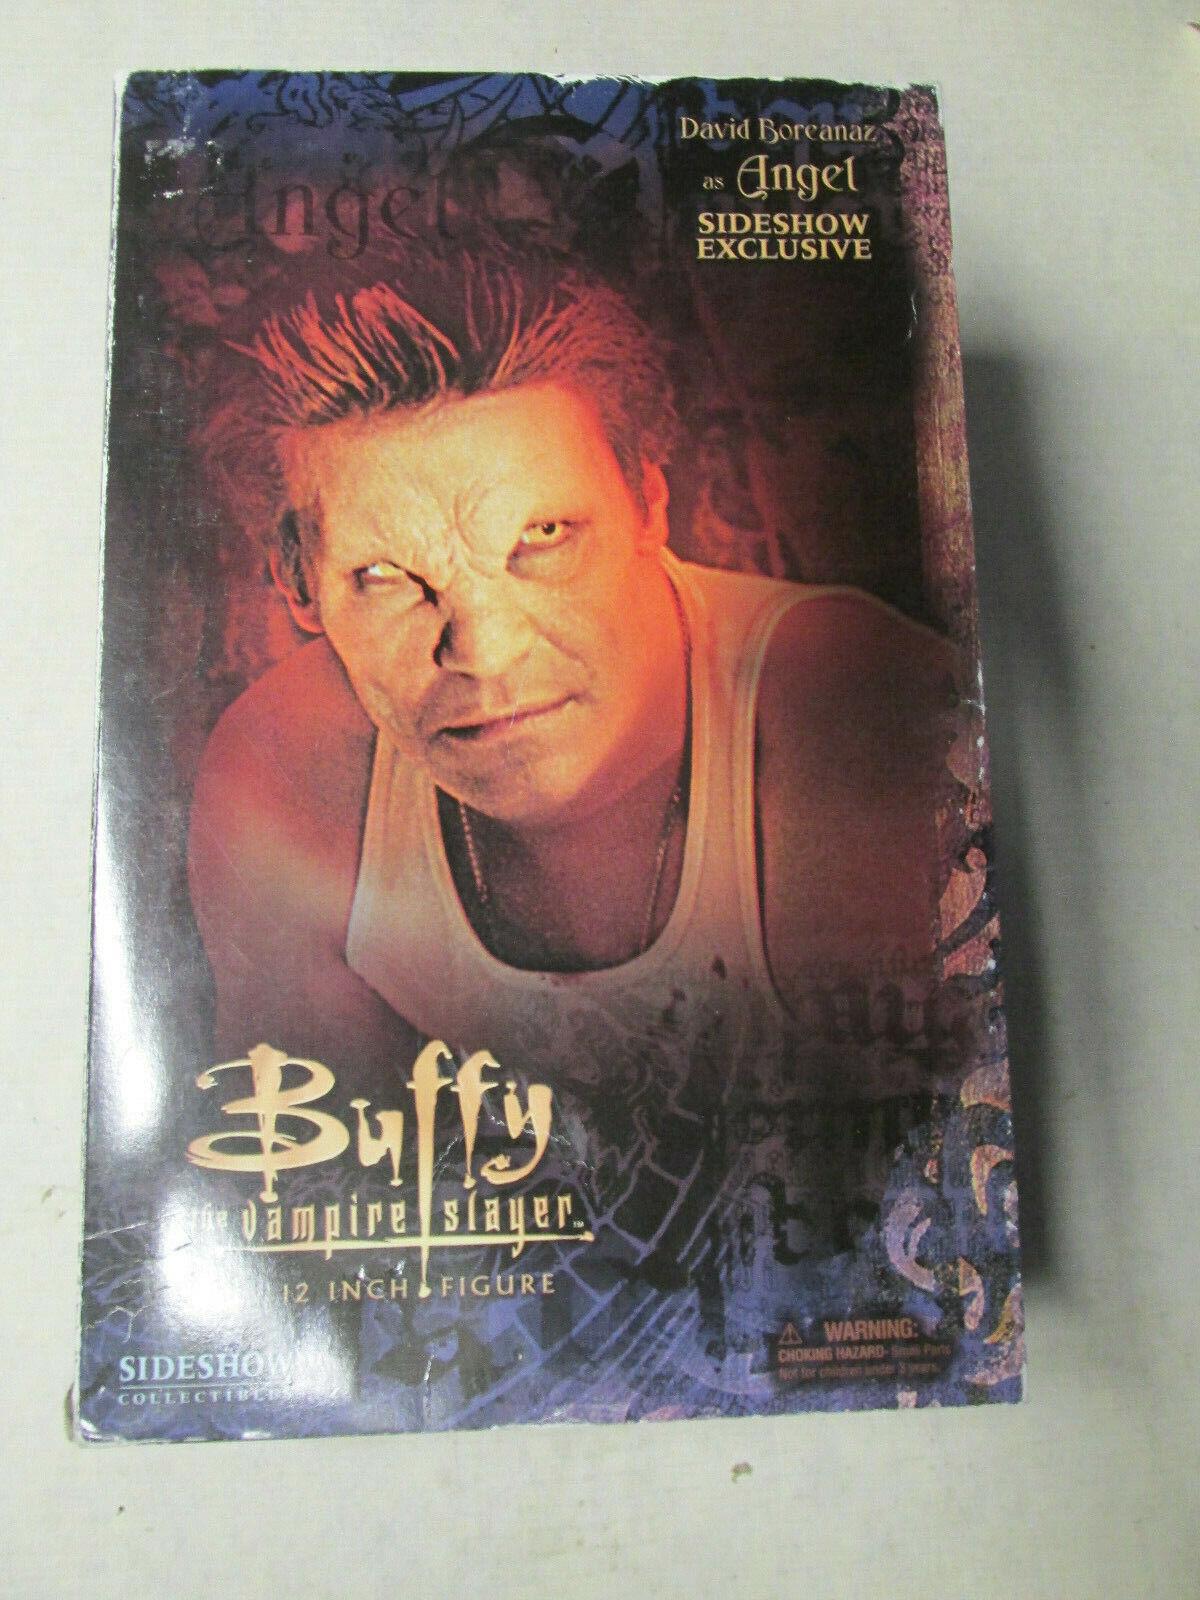 Sidemostrare Buffy The Vampire Slayer Angel David Boreanaz 1 6 MIB